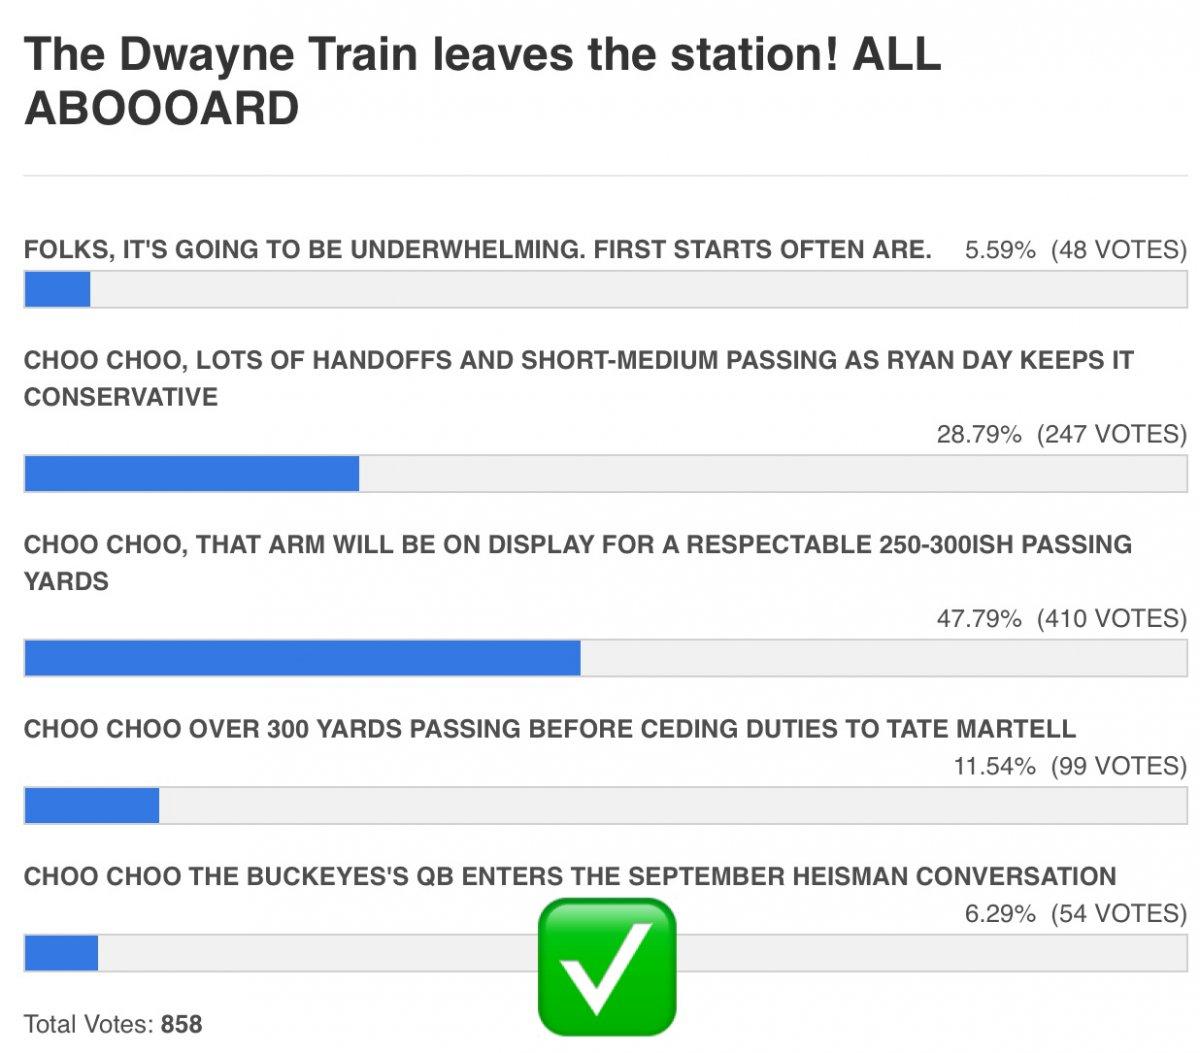 dwayne train